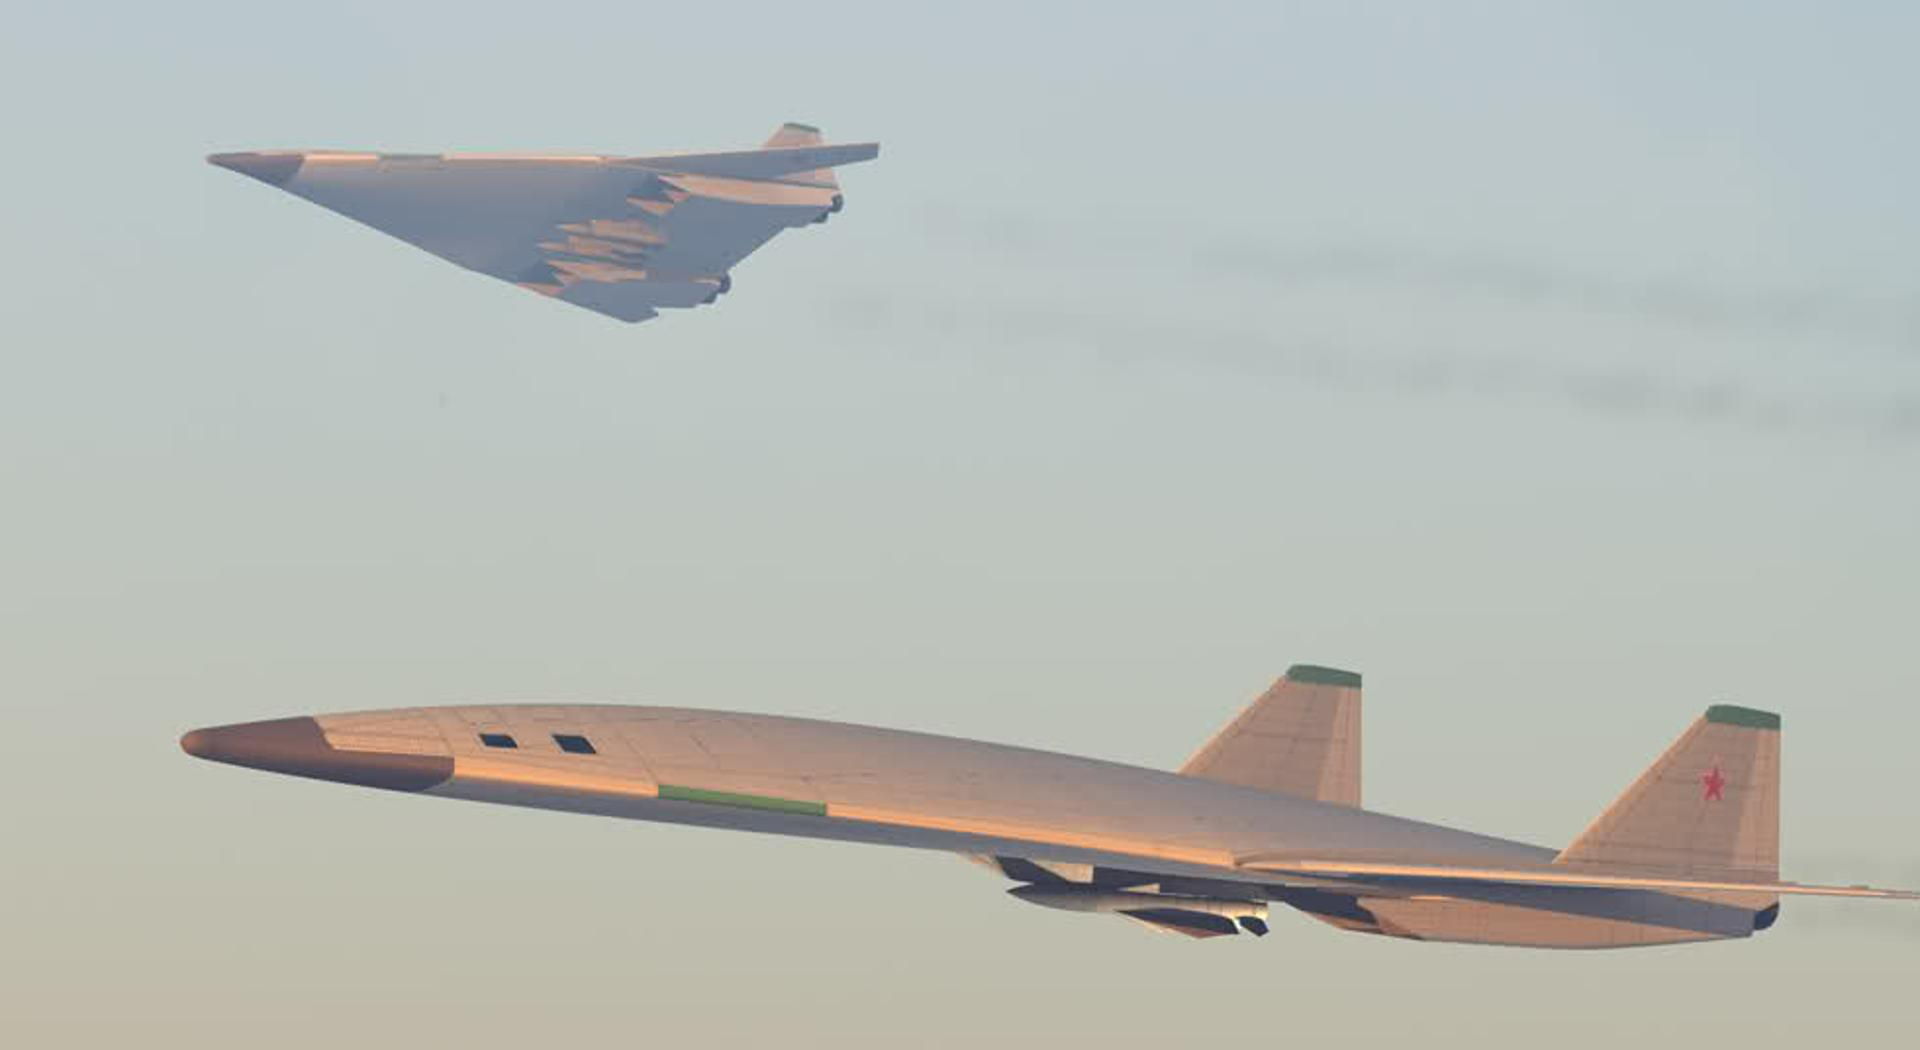 Sticker risitas urss communisme bolchevique avion chasse ufo bombardier bomber tr3b aurora b2